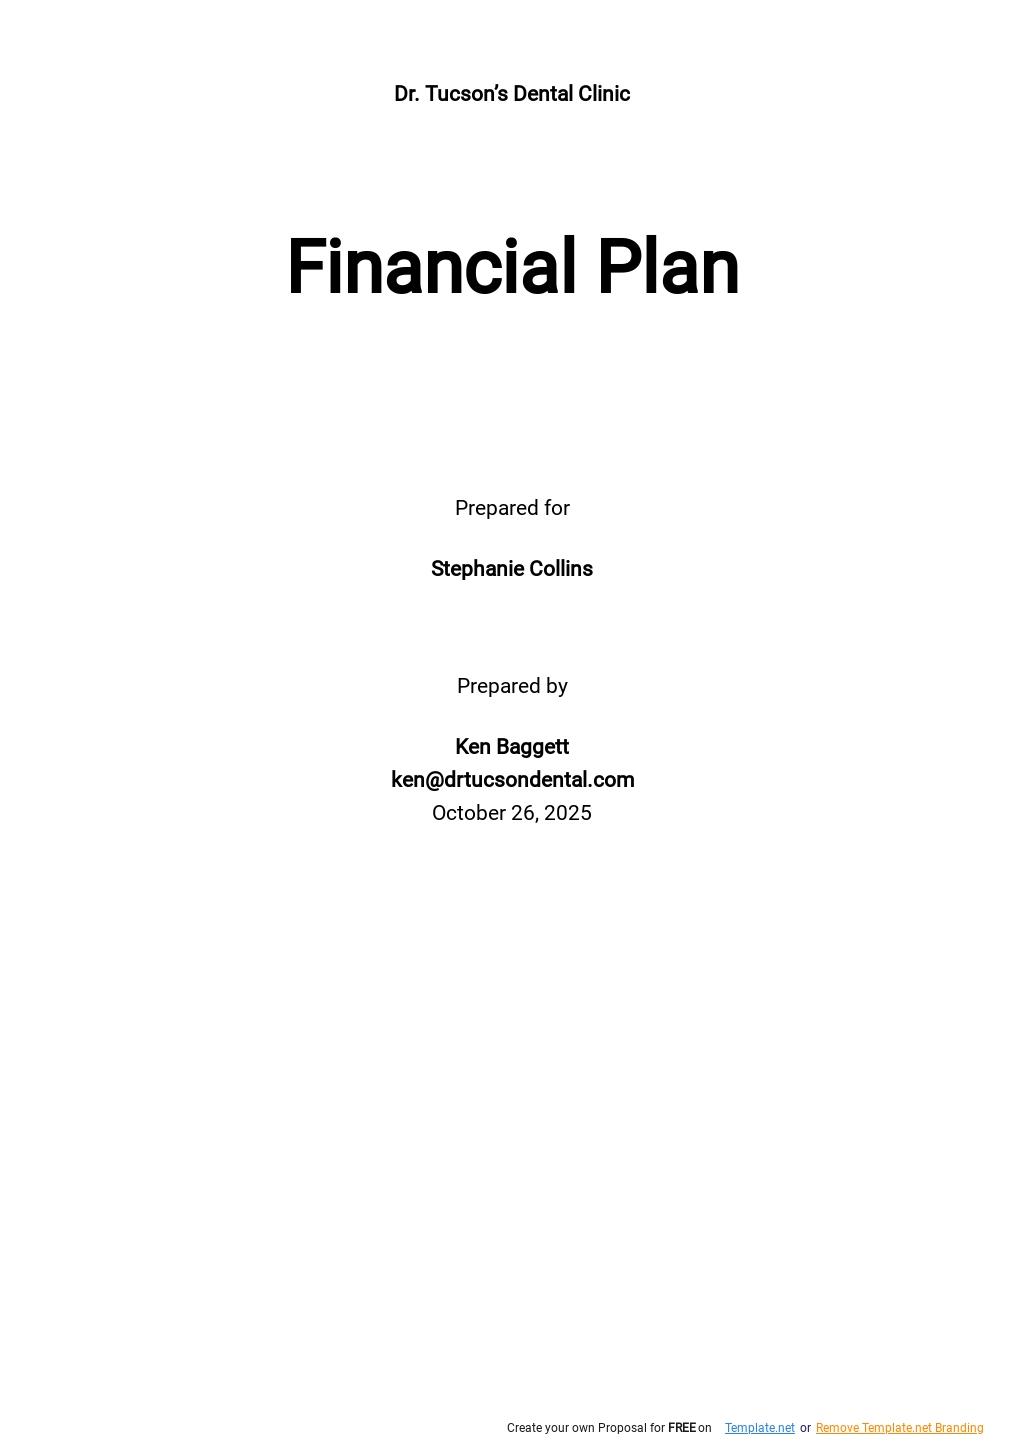 Financial Plan Template.jpe